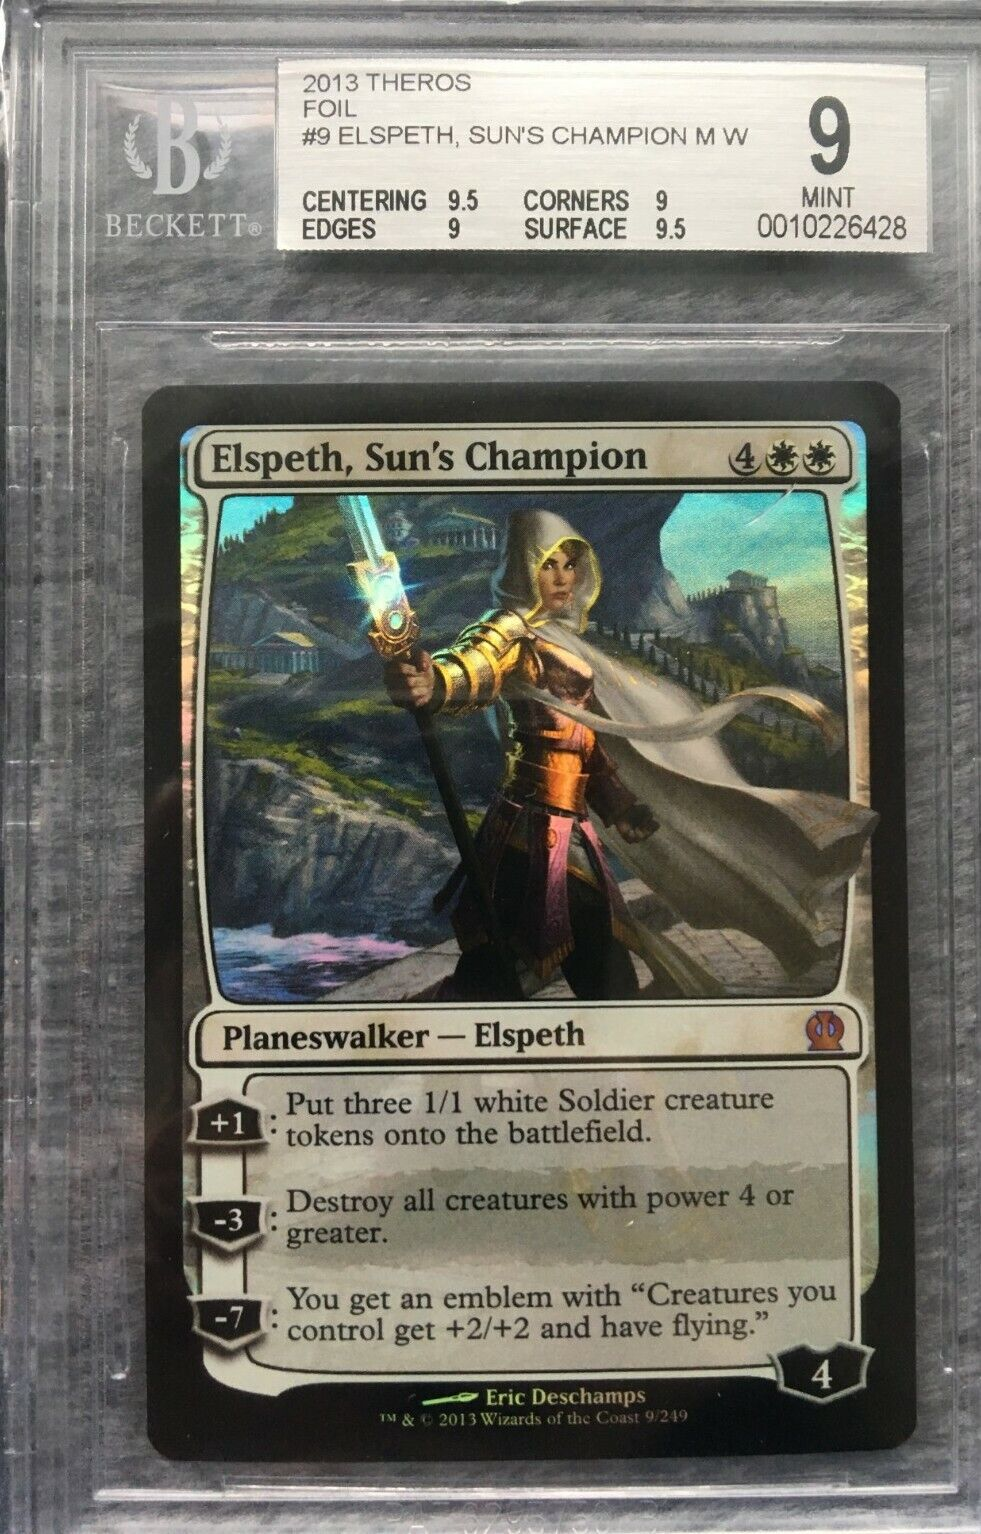 Elspeth, Sun's Champion - MTG - Theros - 2013 - Foil - BGS 9 Mint